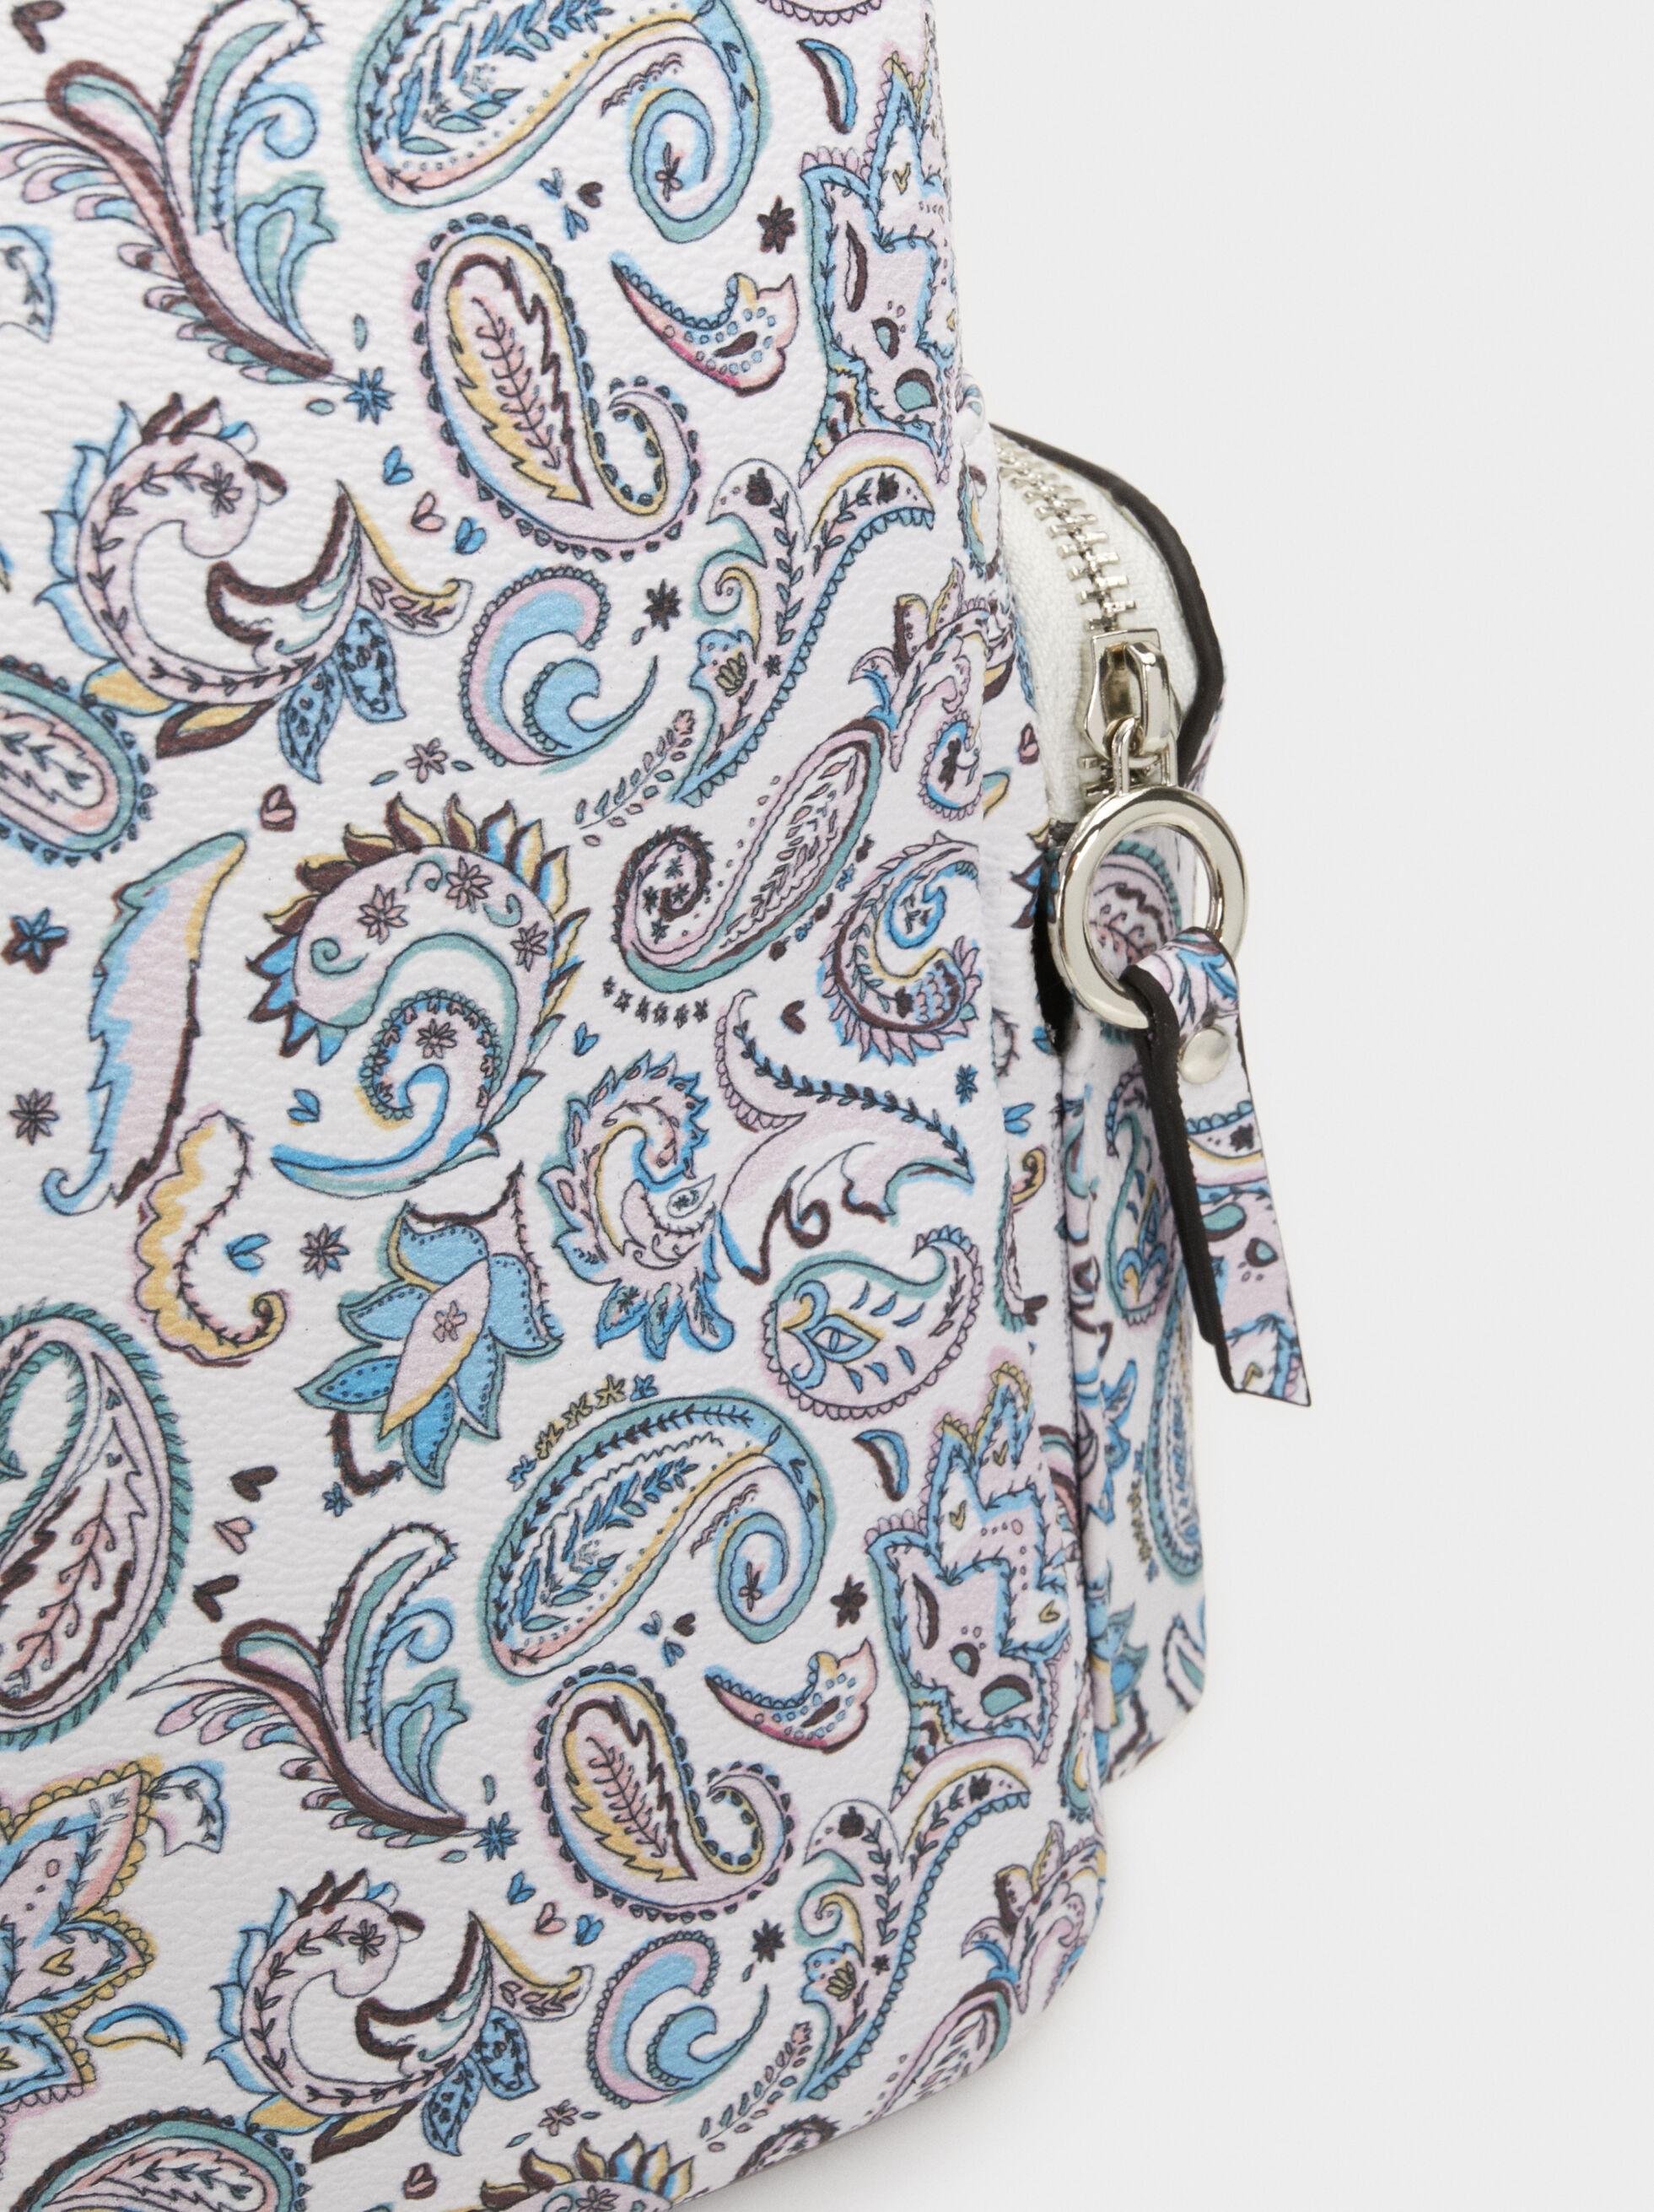 Paisley Print Backpack, Blue, hi-res